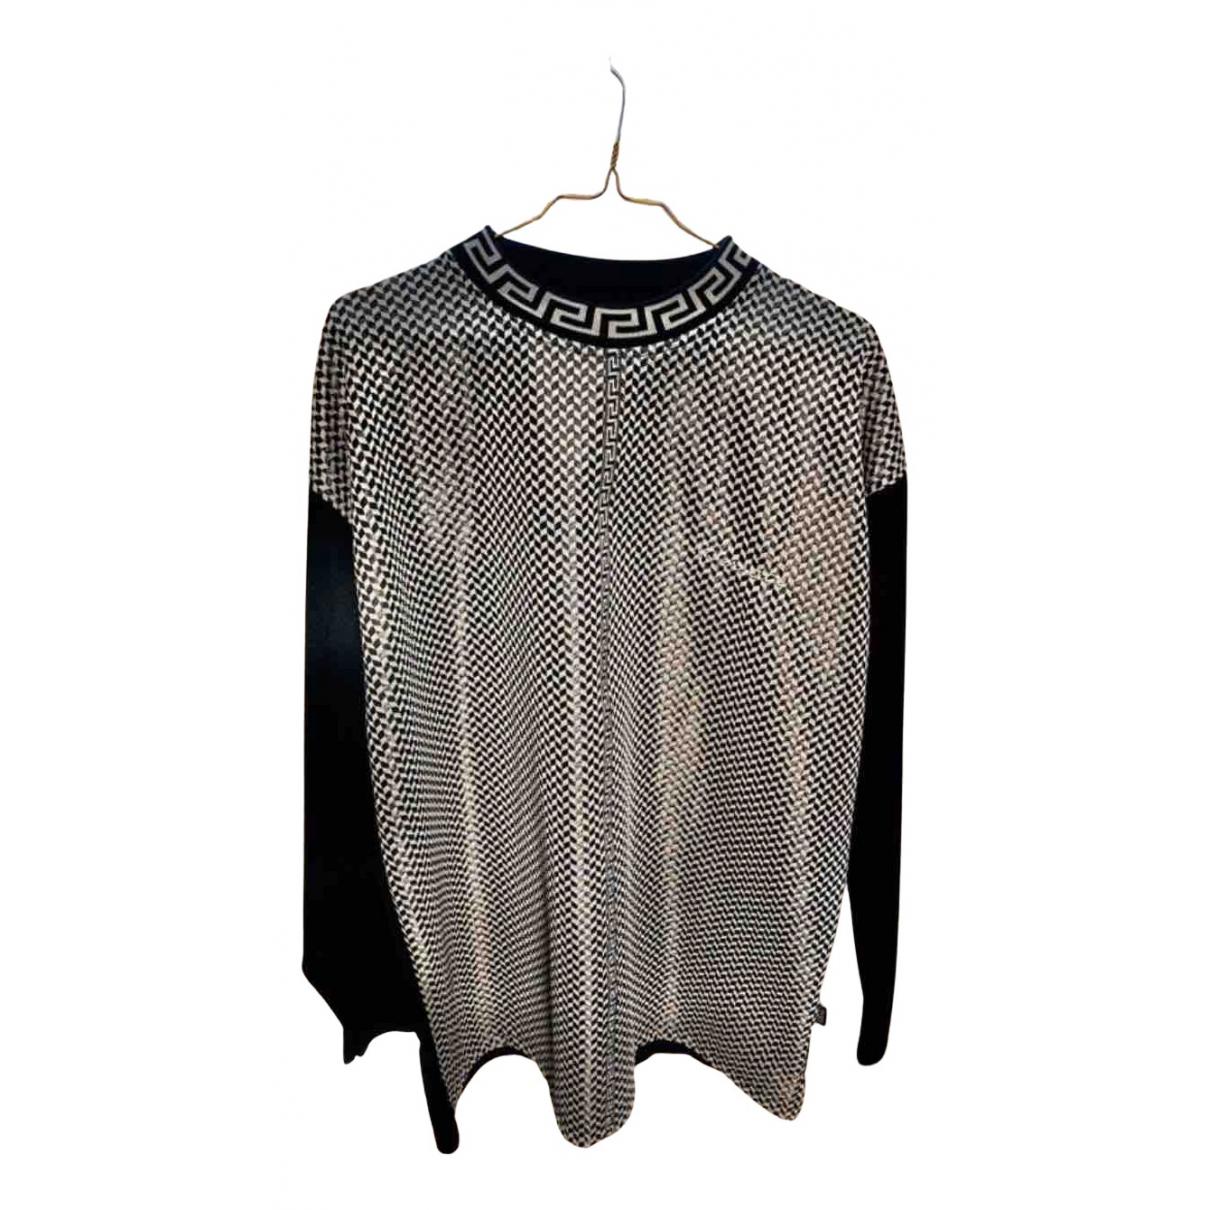 Versace N Multicolour Cotton Knitwear & Sweatshirts for Men XL International